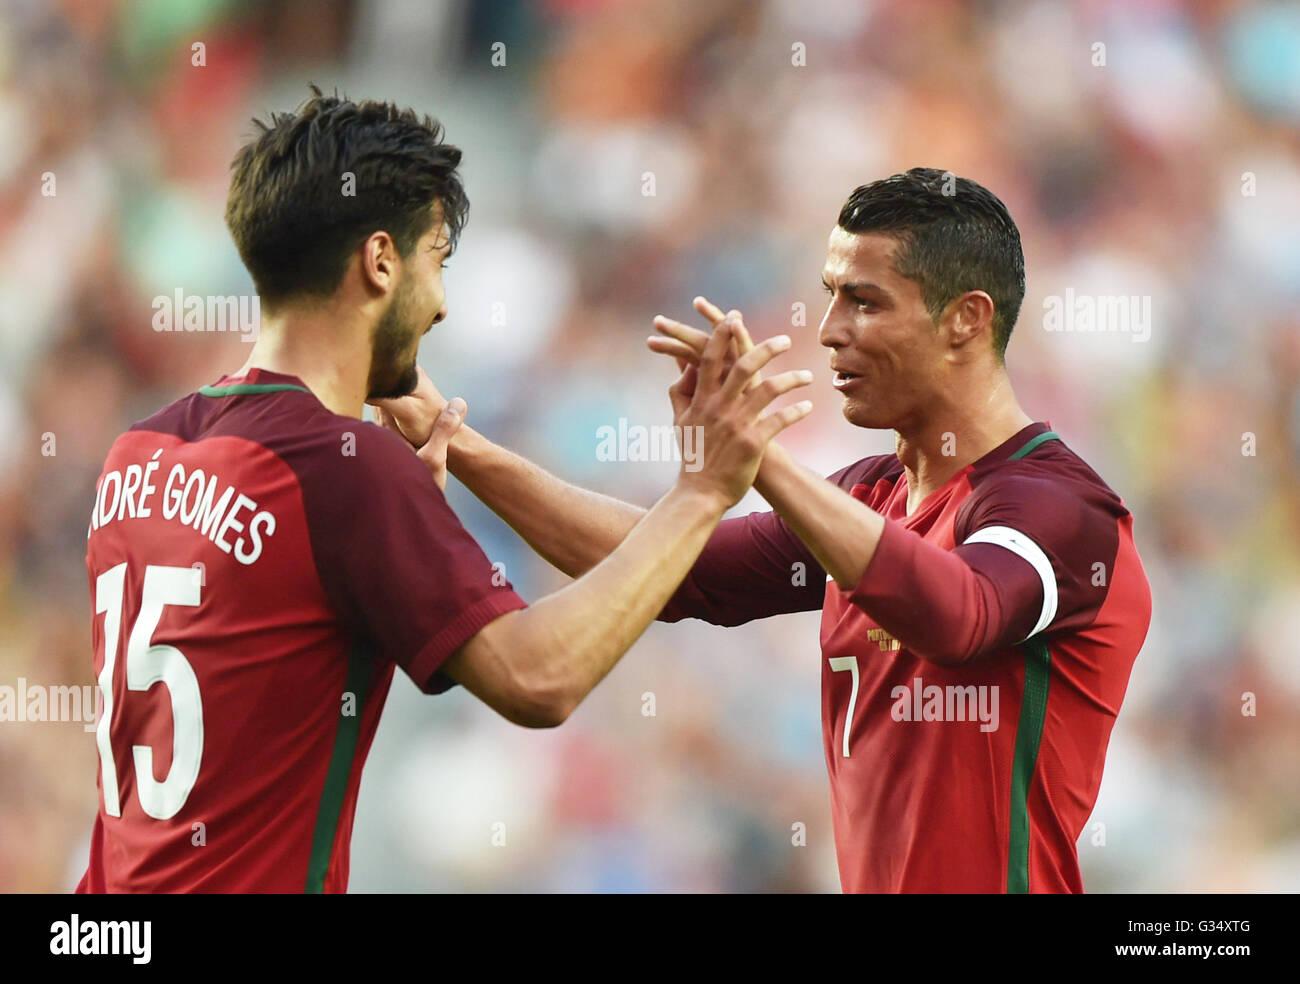 Cristiano Ronaldo Portugal Goal Stock Photos   Cristiano Ronaldo ... a7e74b9b4c47c